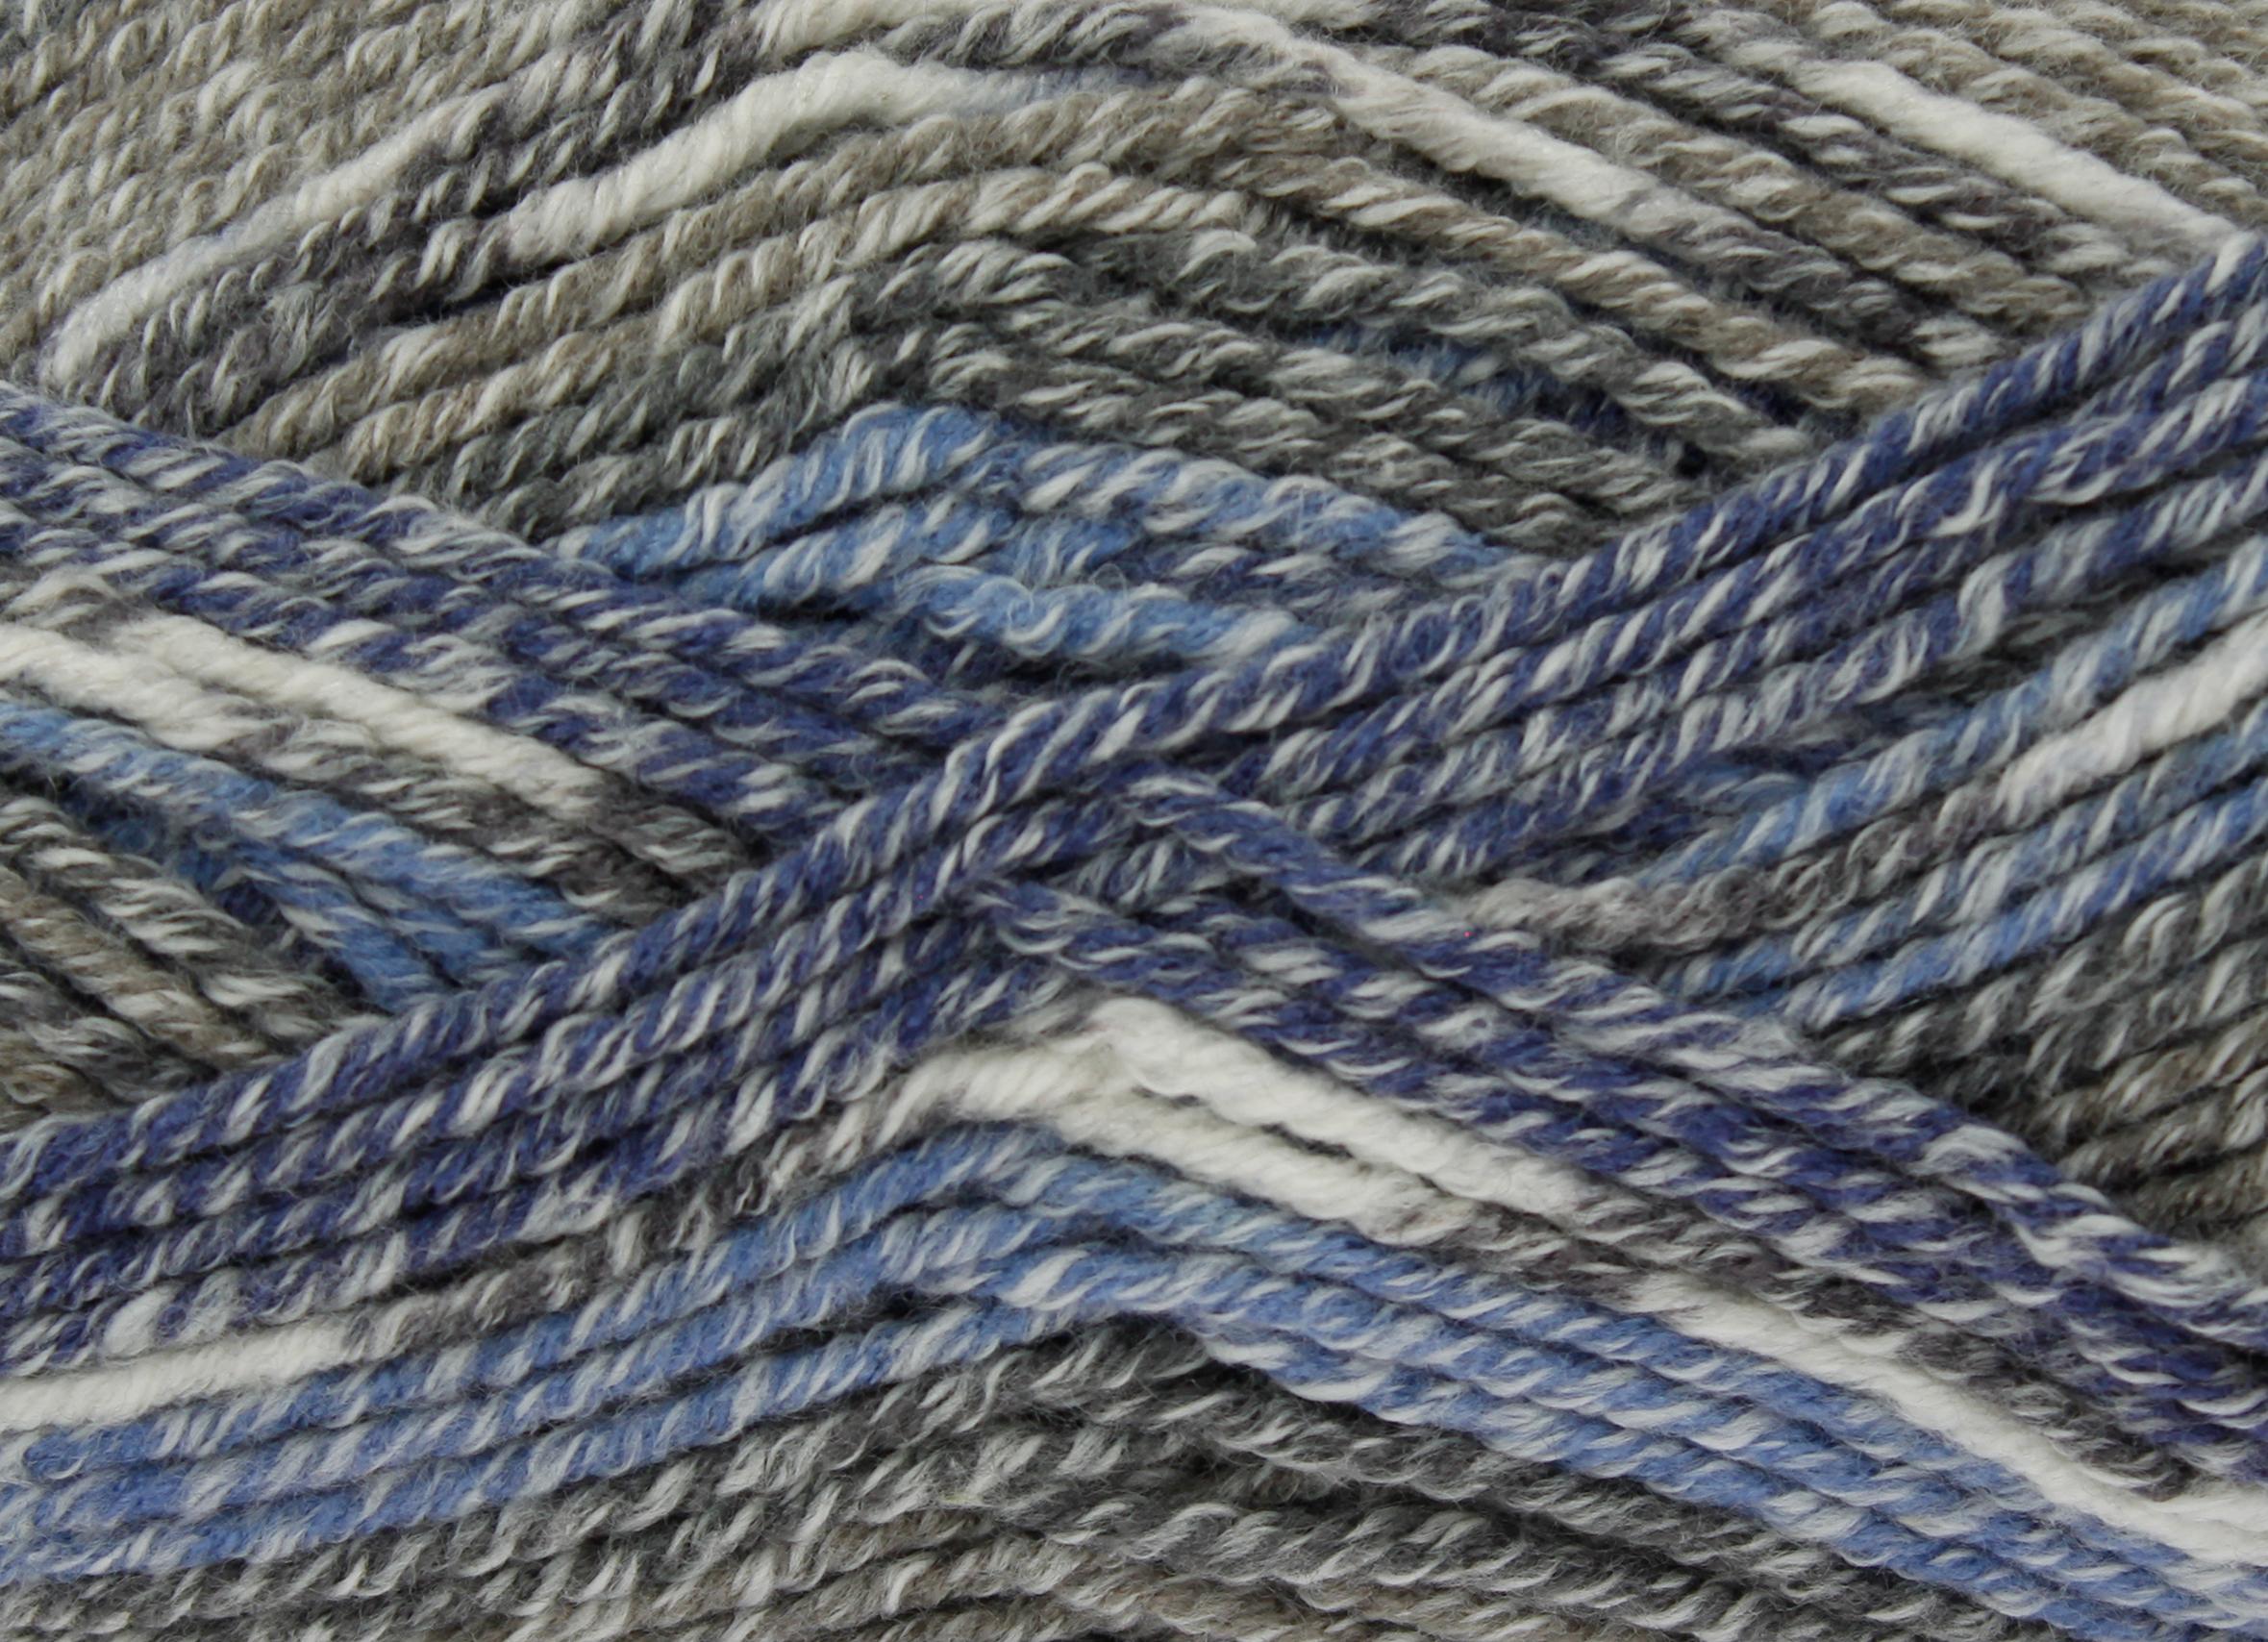 King Cole Drifter Chunky Knitting Yarn Cotton Acrylic Wool 100g Ball